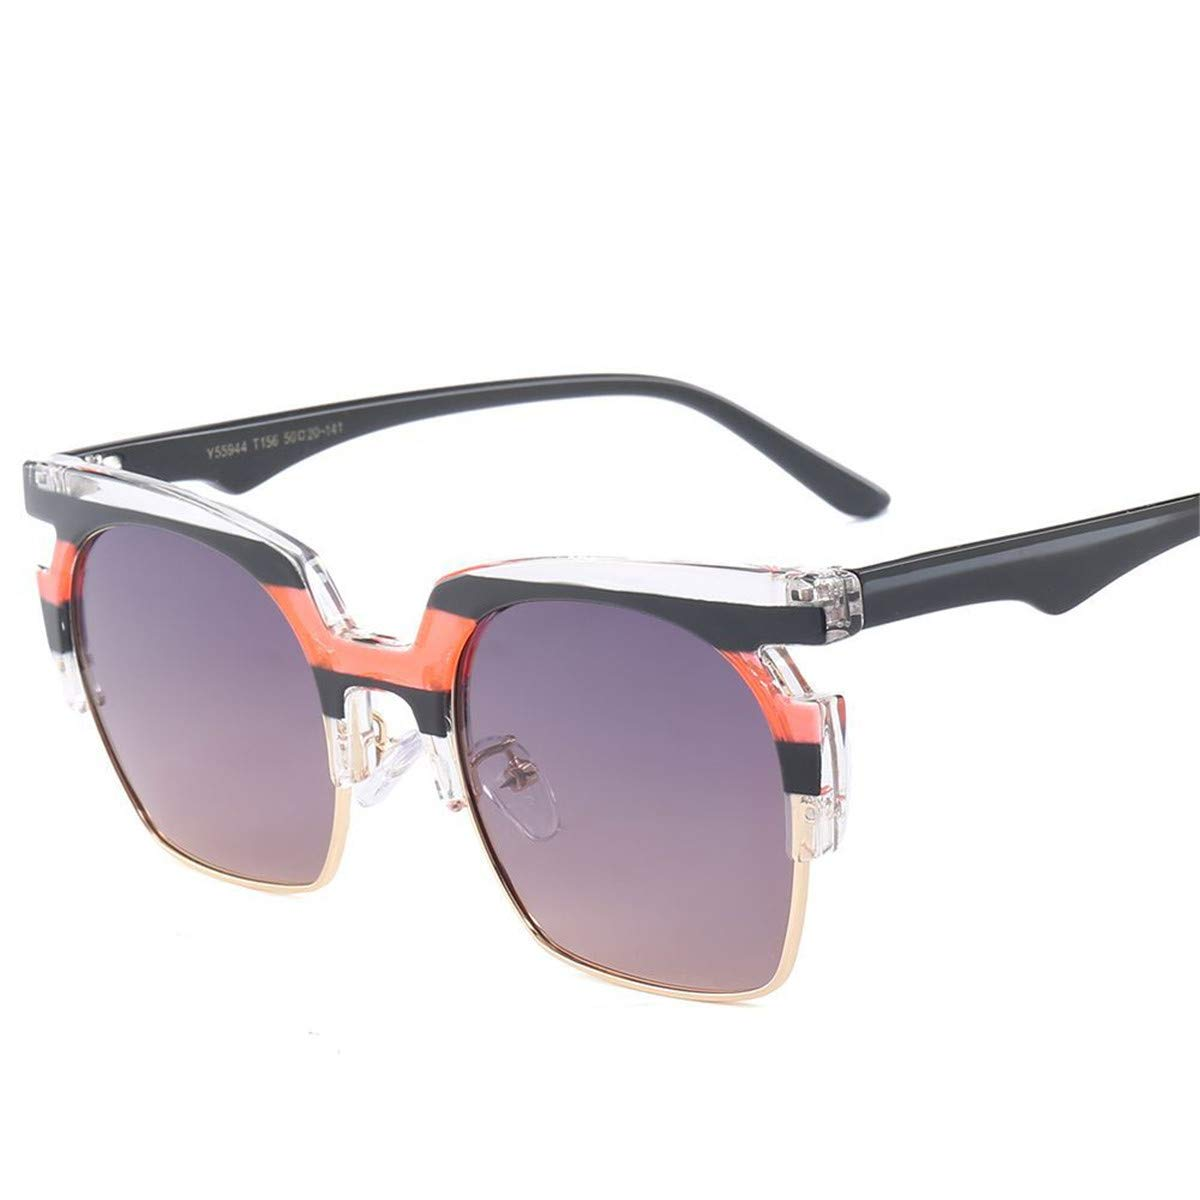 ee35854568bf1e KOMNY Fashion Polarized Sunglasses Men Women Driving Sun Glasses Male  Square Glasses Polaroid UV400 zonnebril mannen G55944